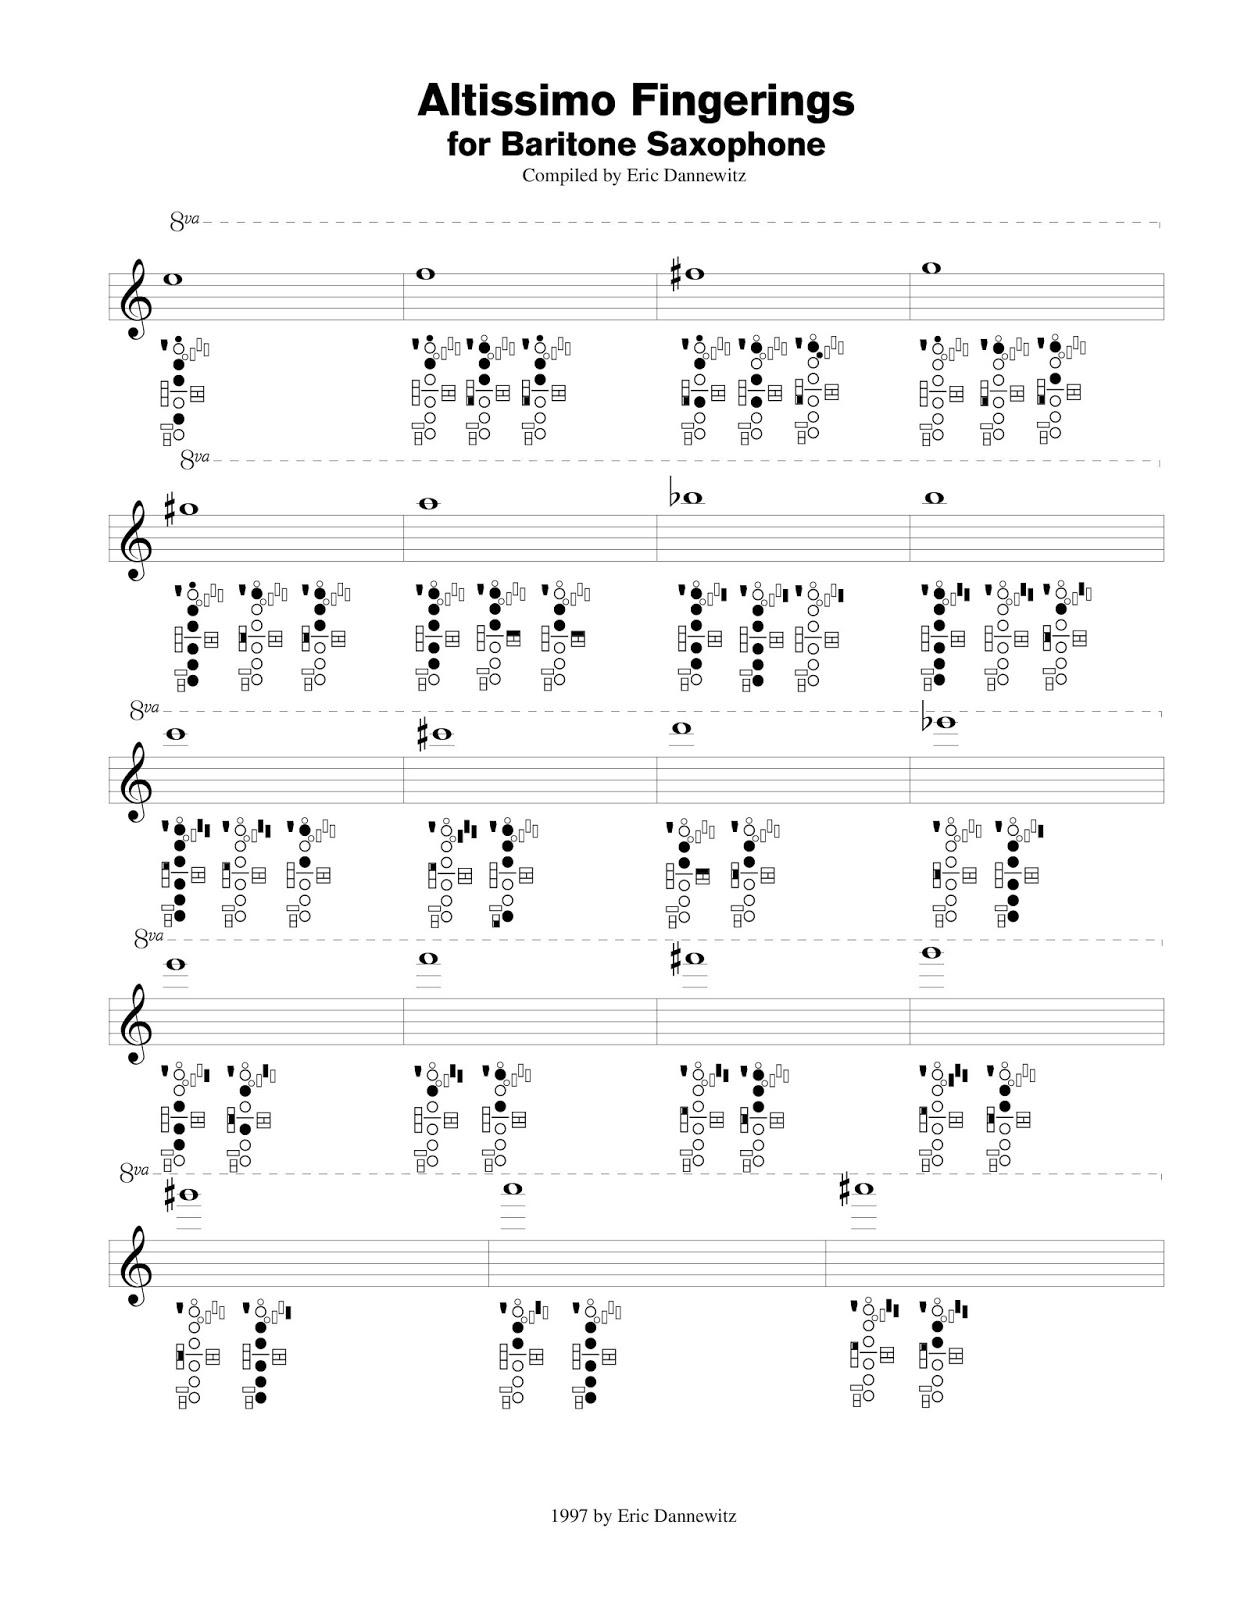 Altissimor Chart For Baritone Saxophone